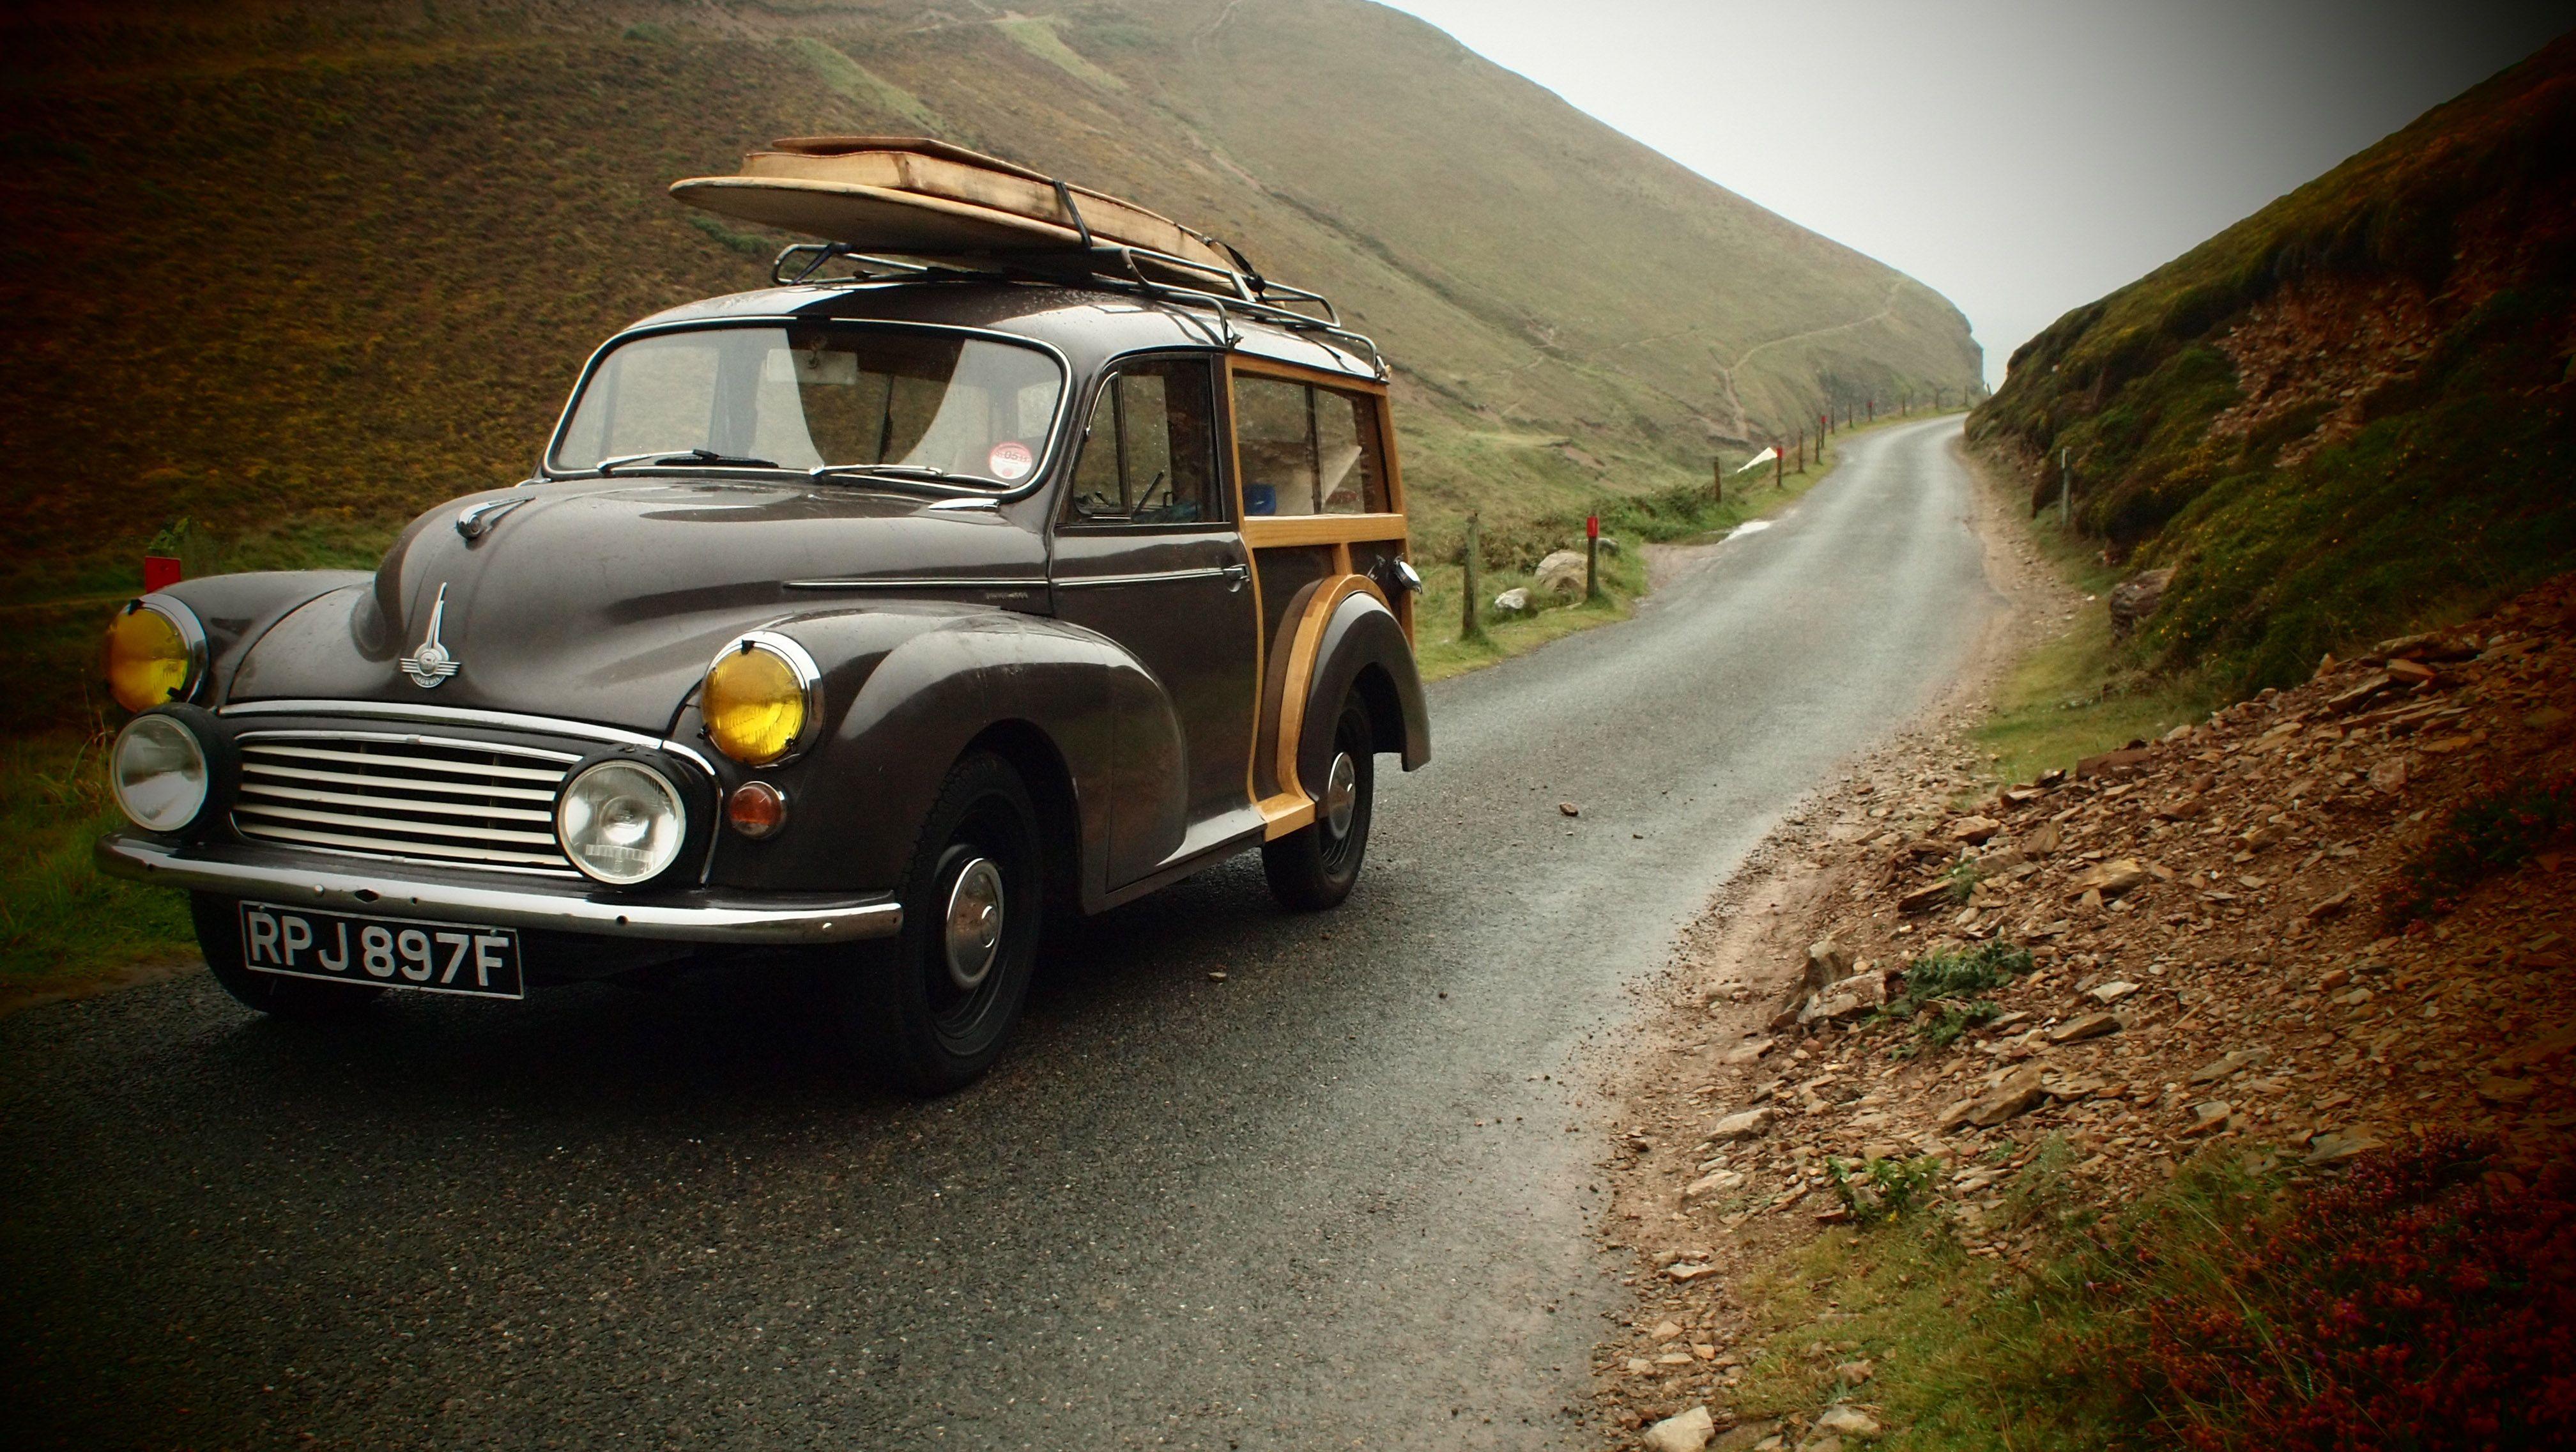 Vintage Surf Wagons | Influx Magazine influx.co.uk | Cars ...